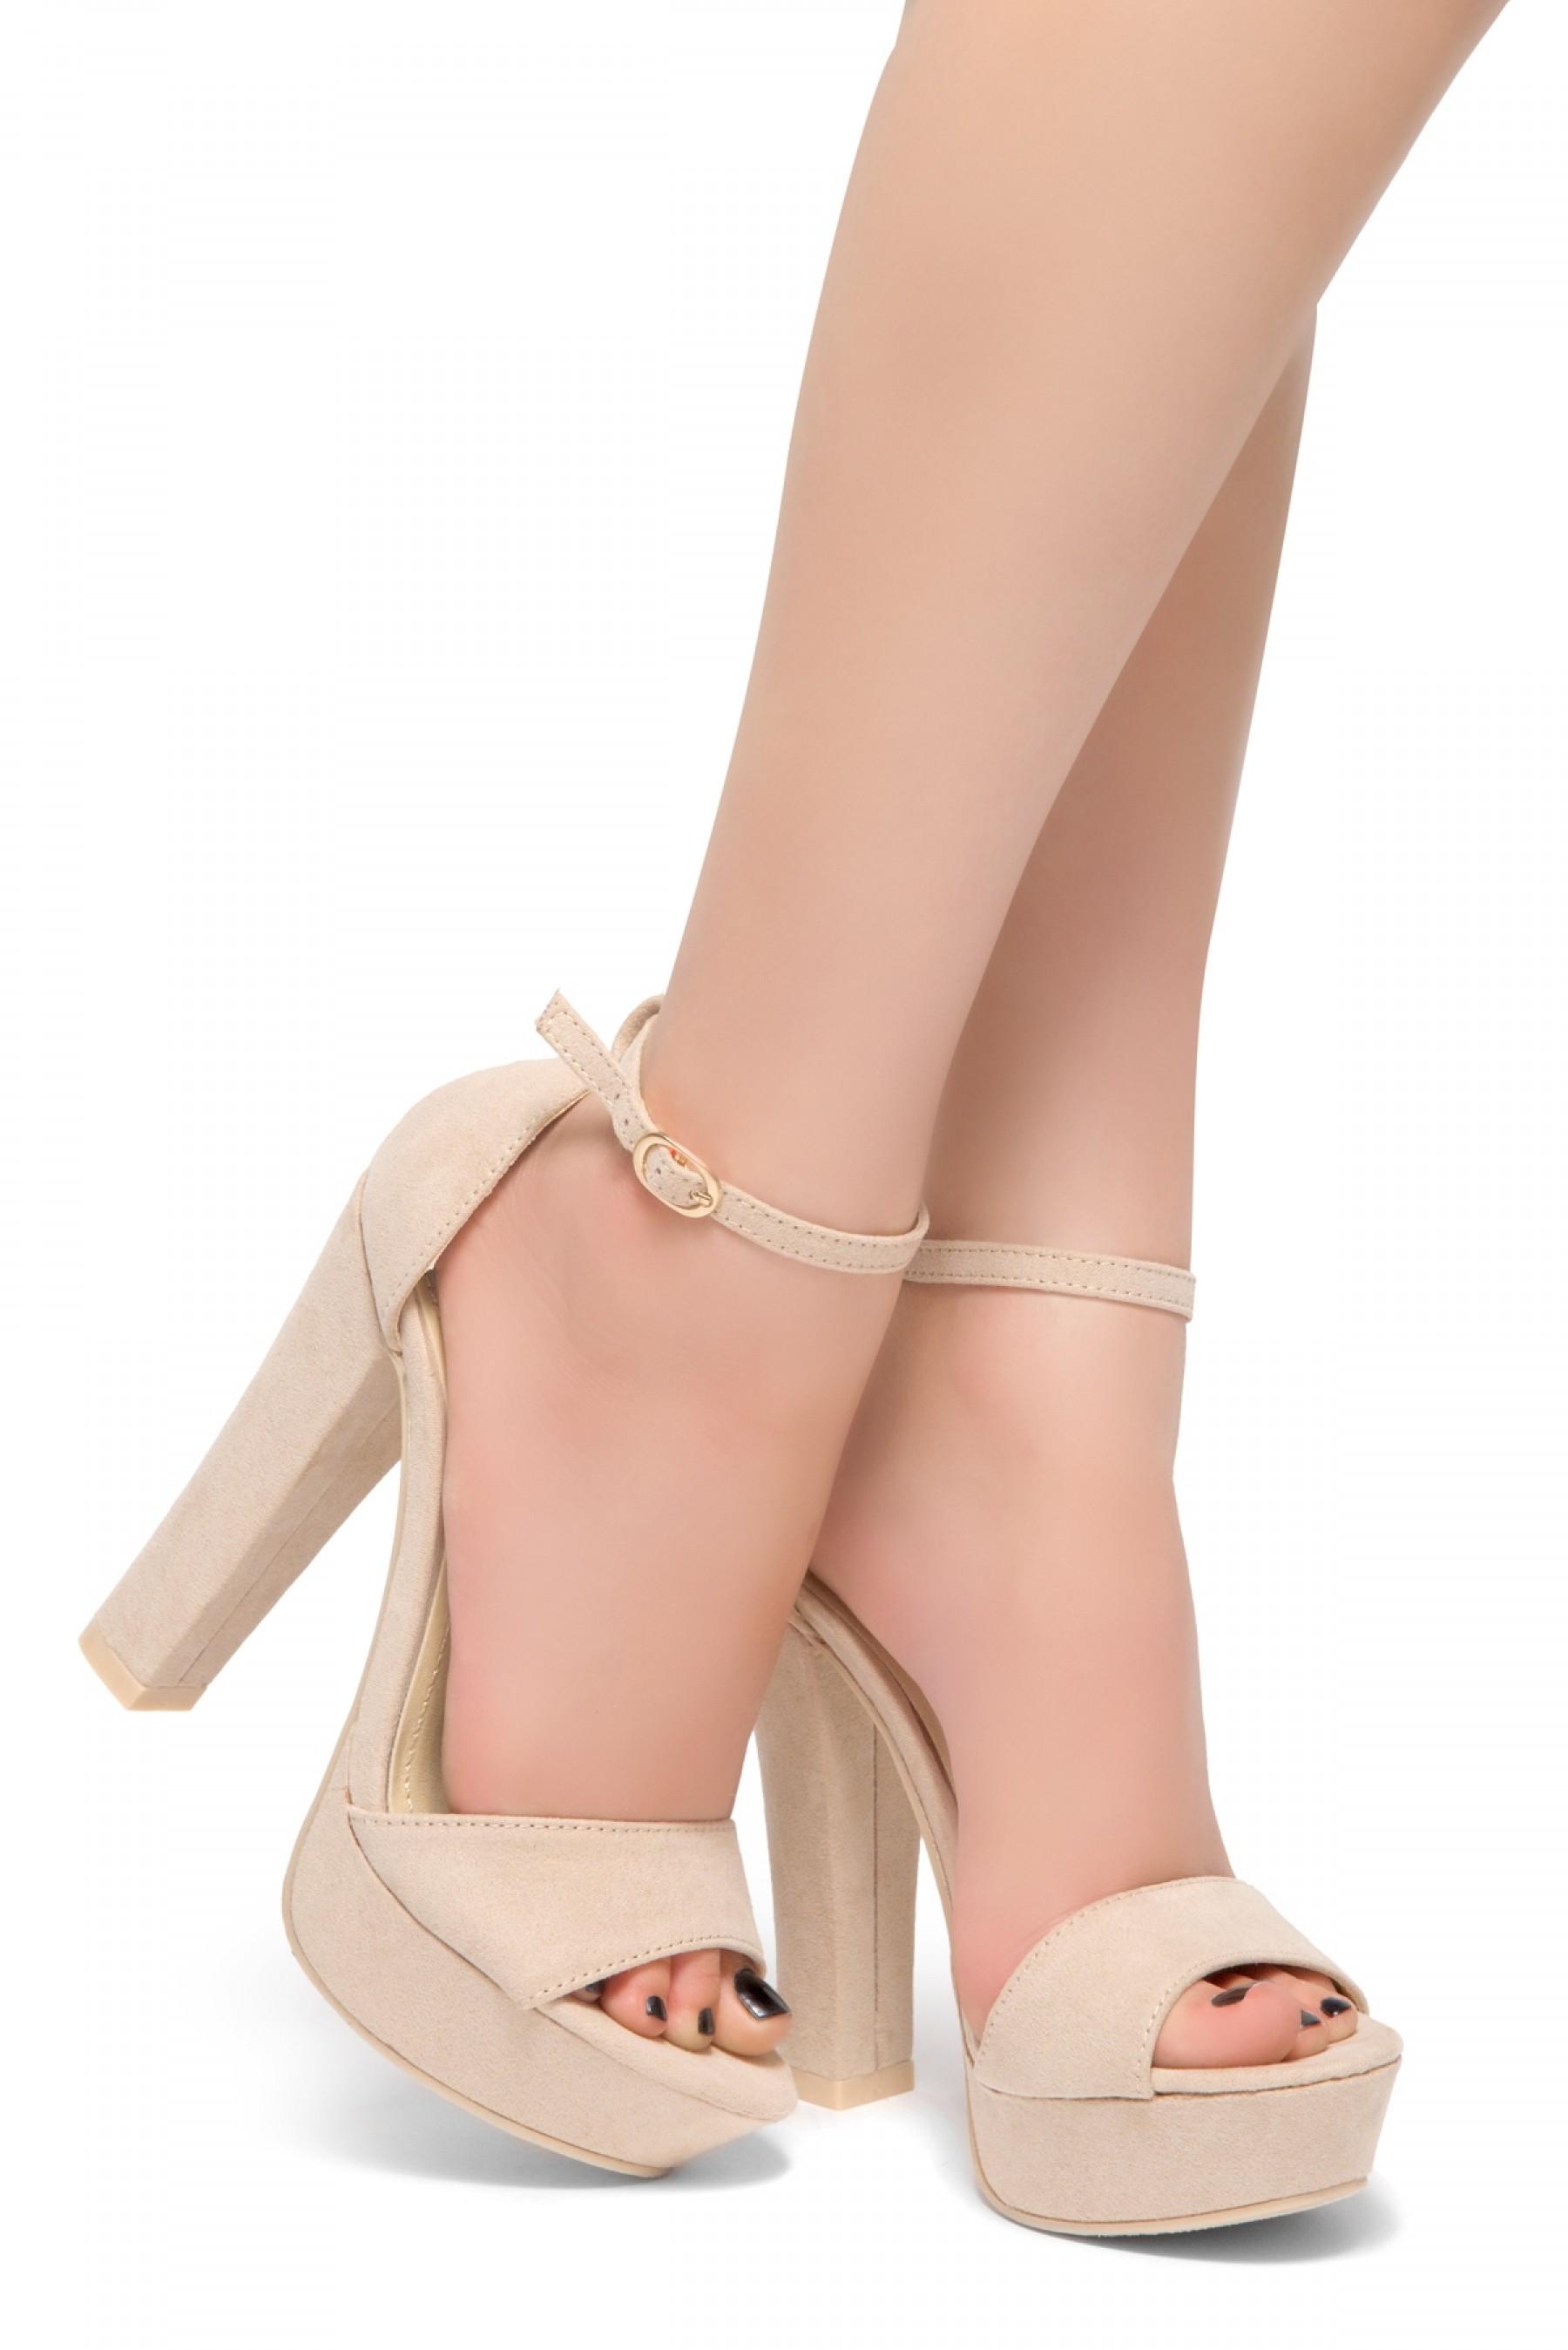 f1cc96903af HerStyle Island-Chunky heel, Adjustable Ankle Strap (Blush)